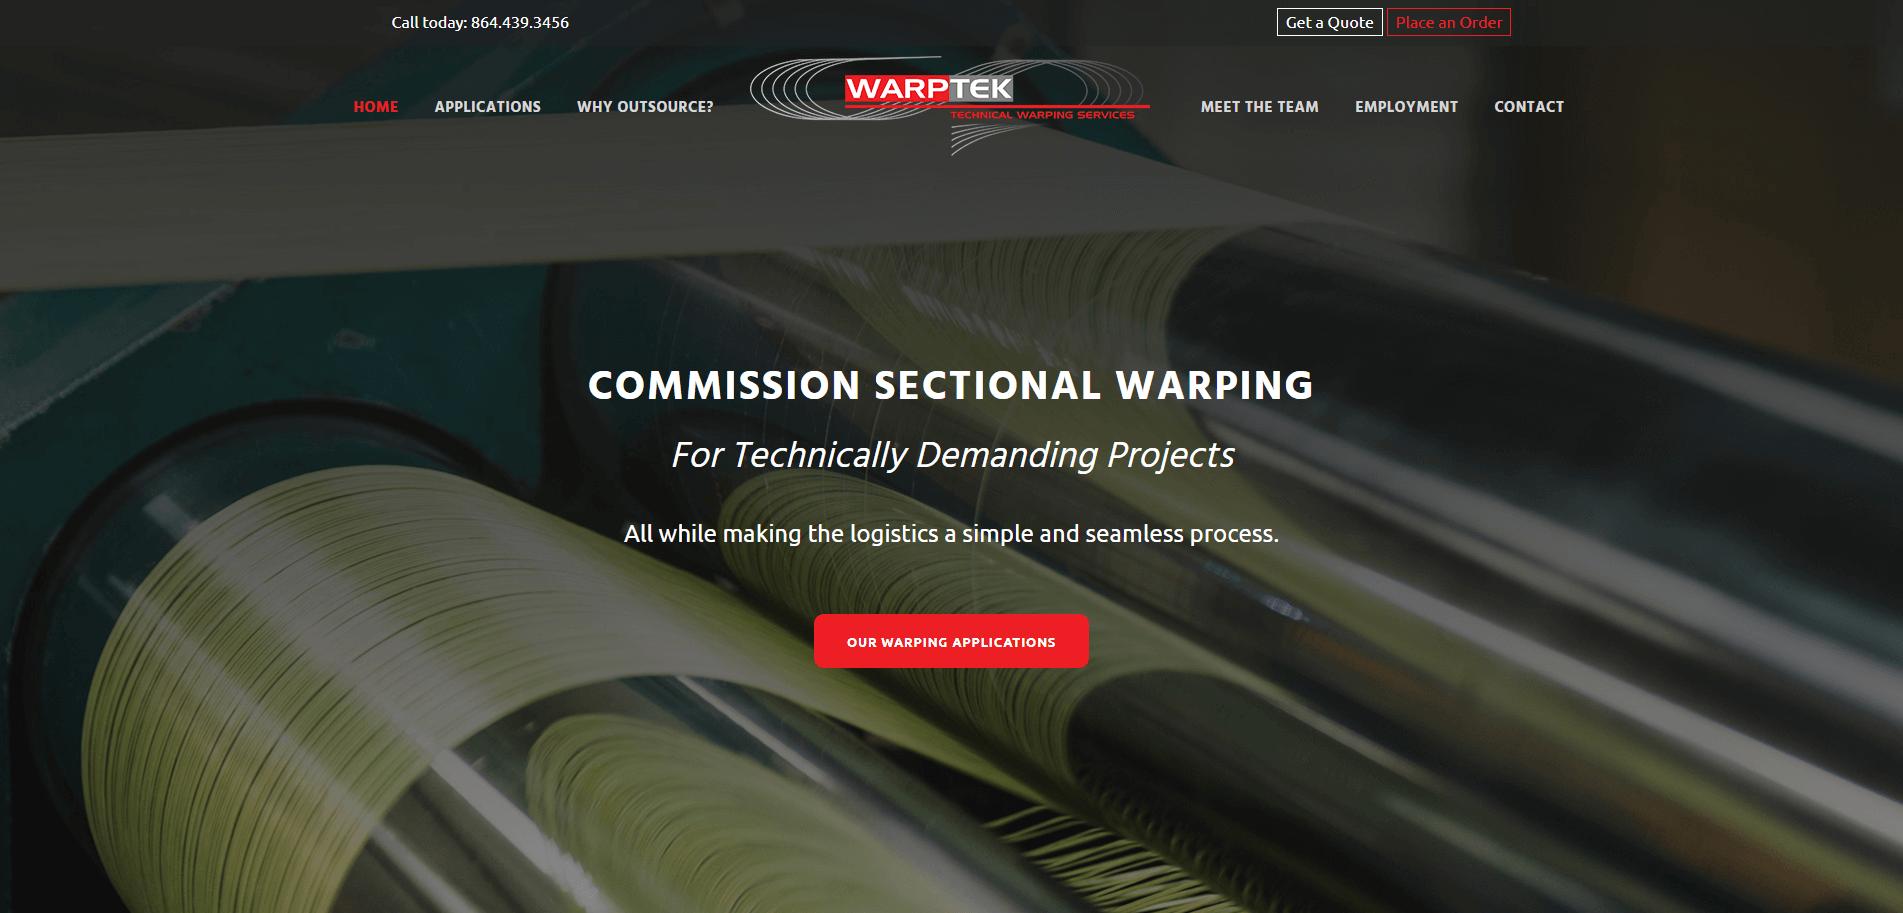 The homepage for the WarpTek website